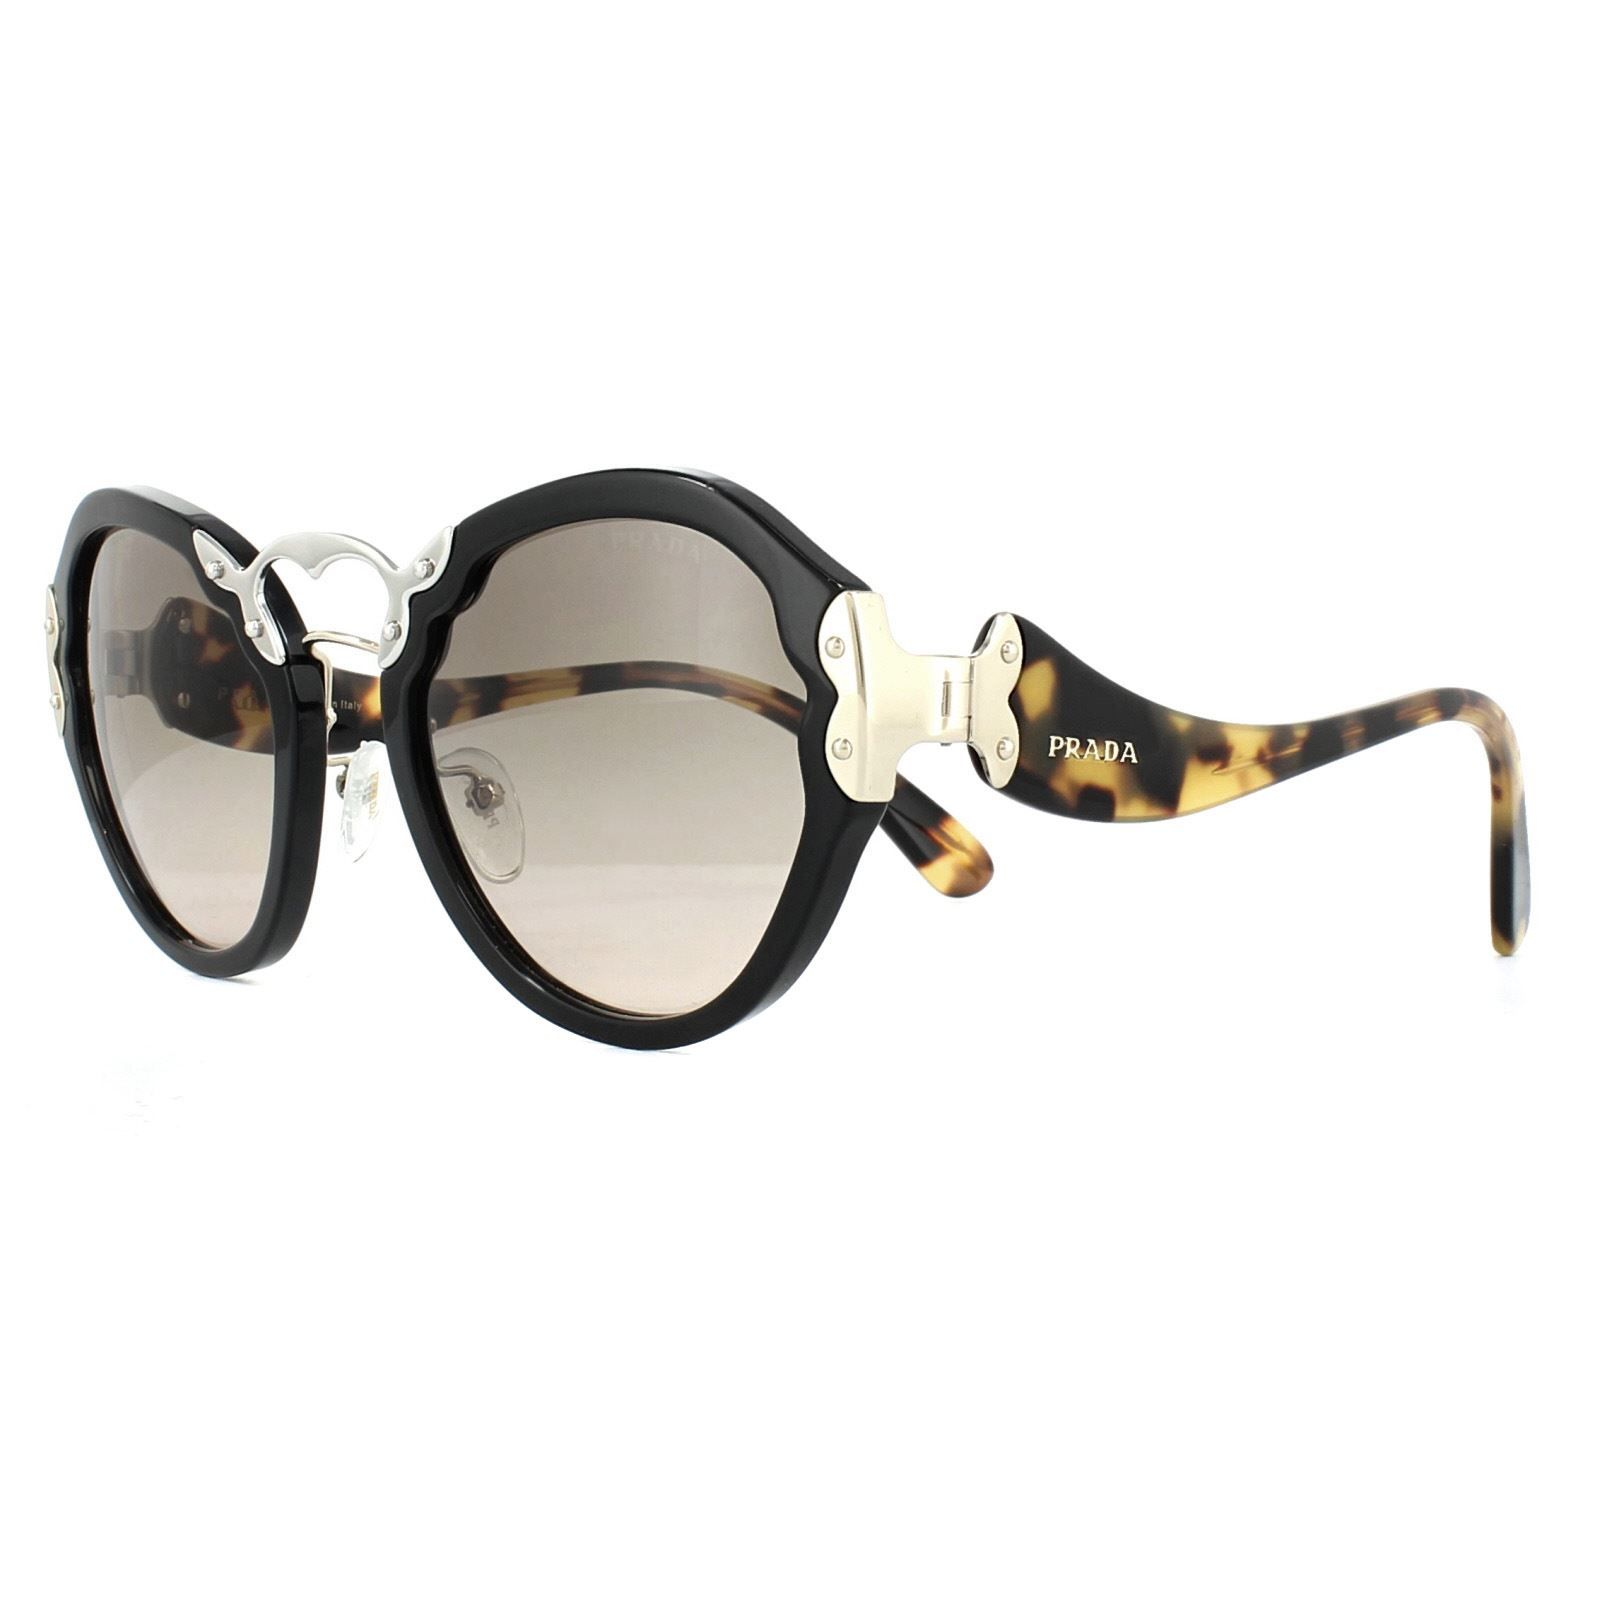 Prada Sunglasses 09TS 1AB3D0 Black Brown Gradient Grey